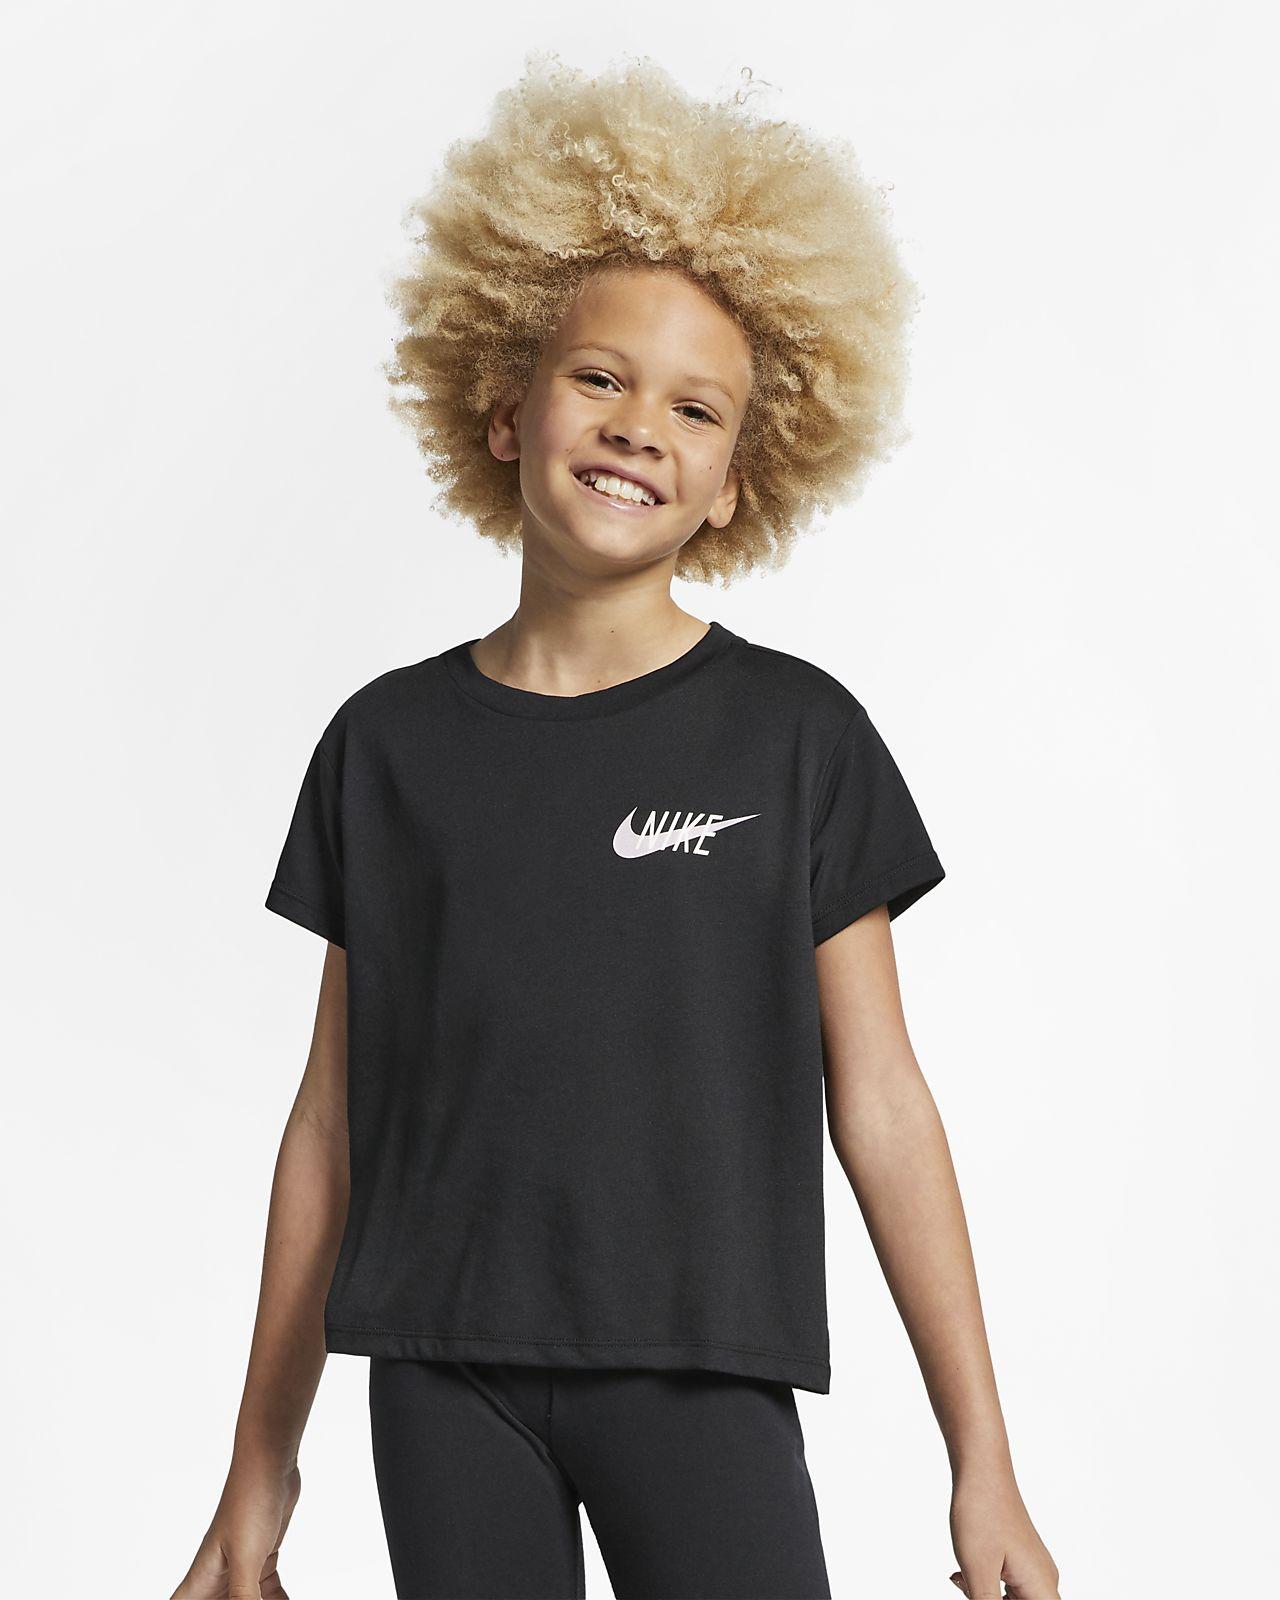 Nike Dri-FIT Older Kids' (Girls') Short-Sleeve Training Top